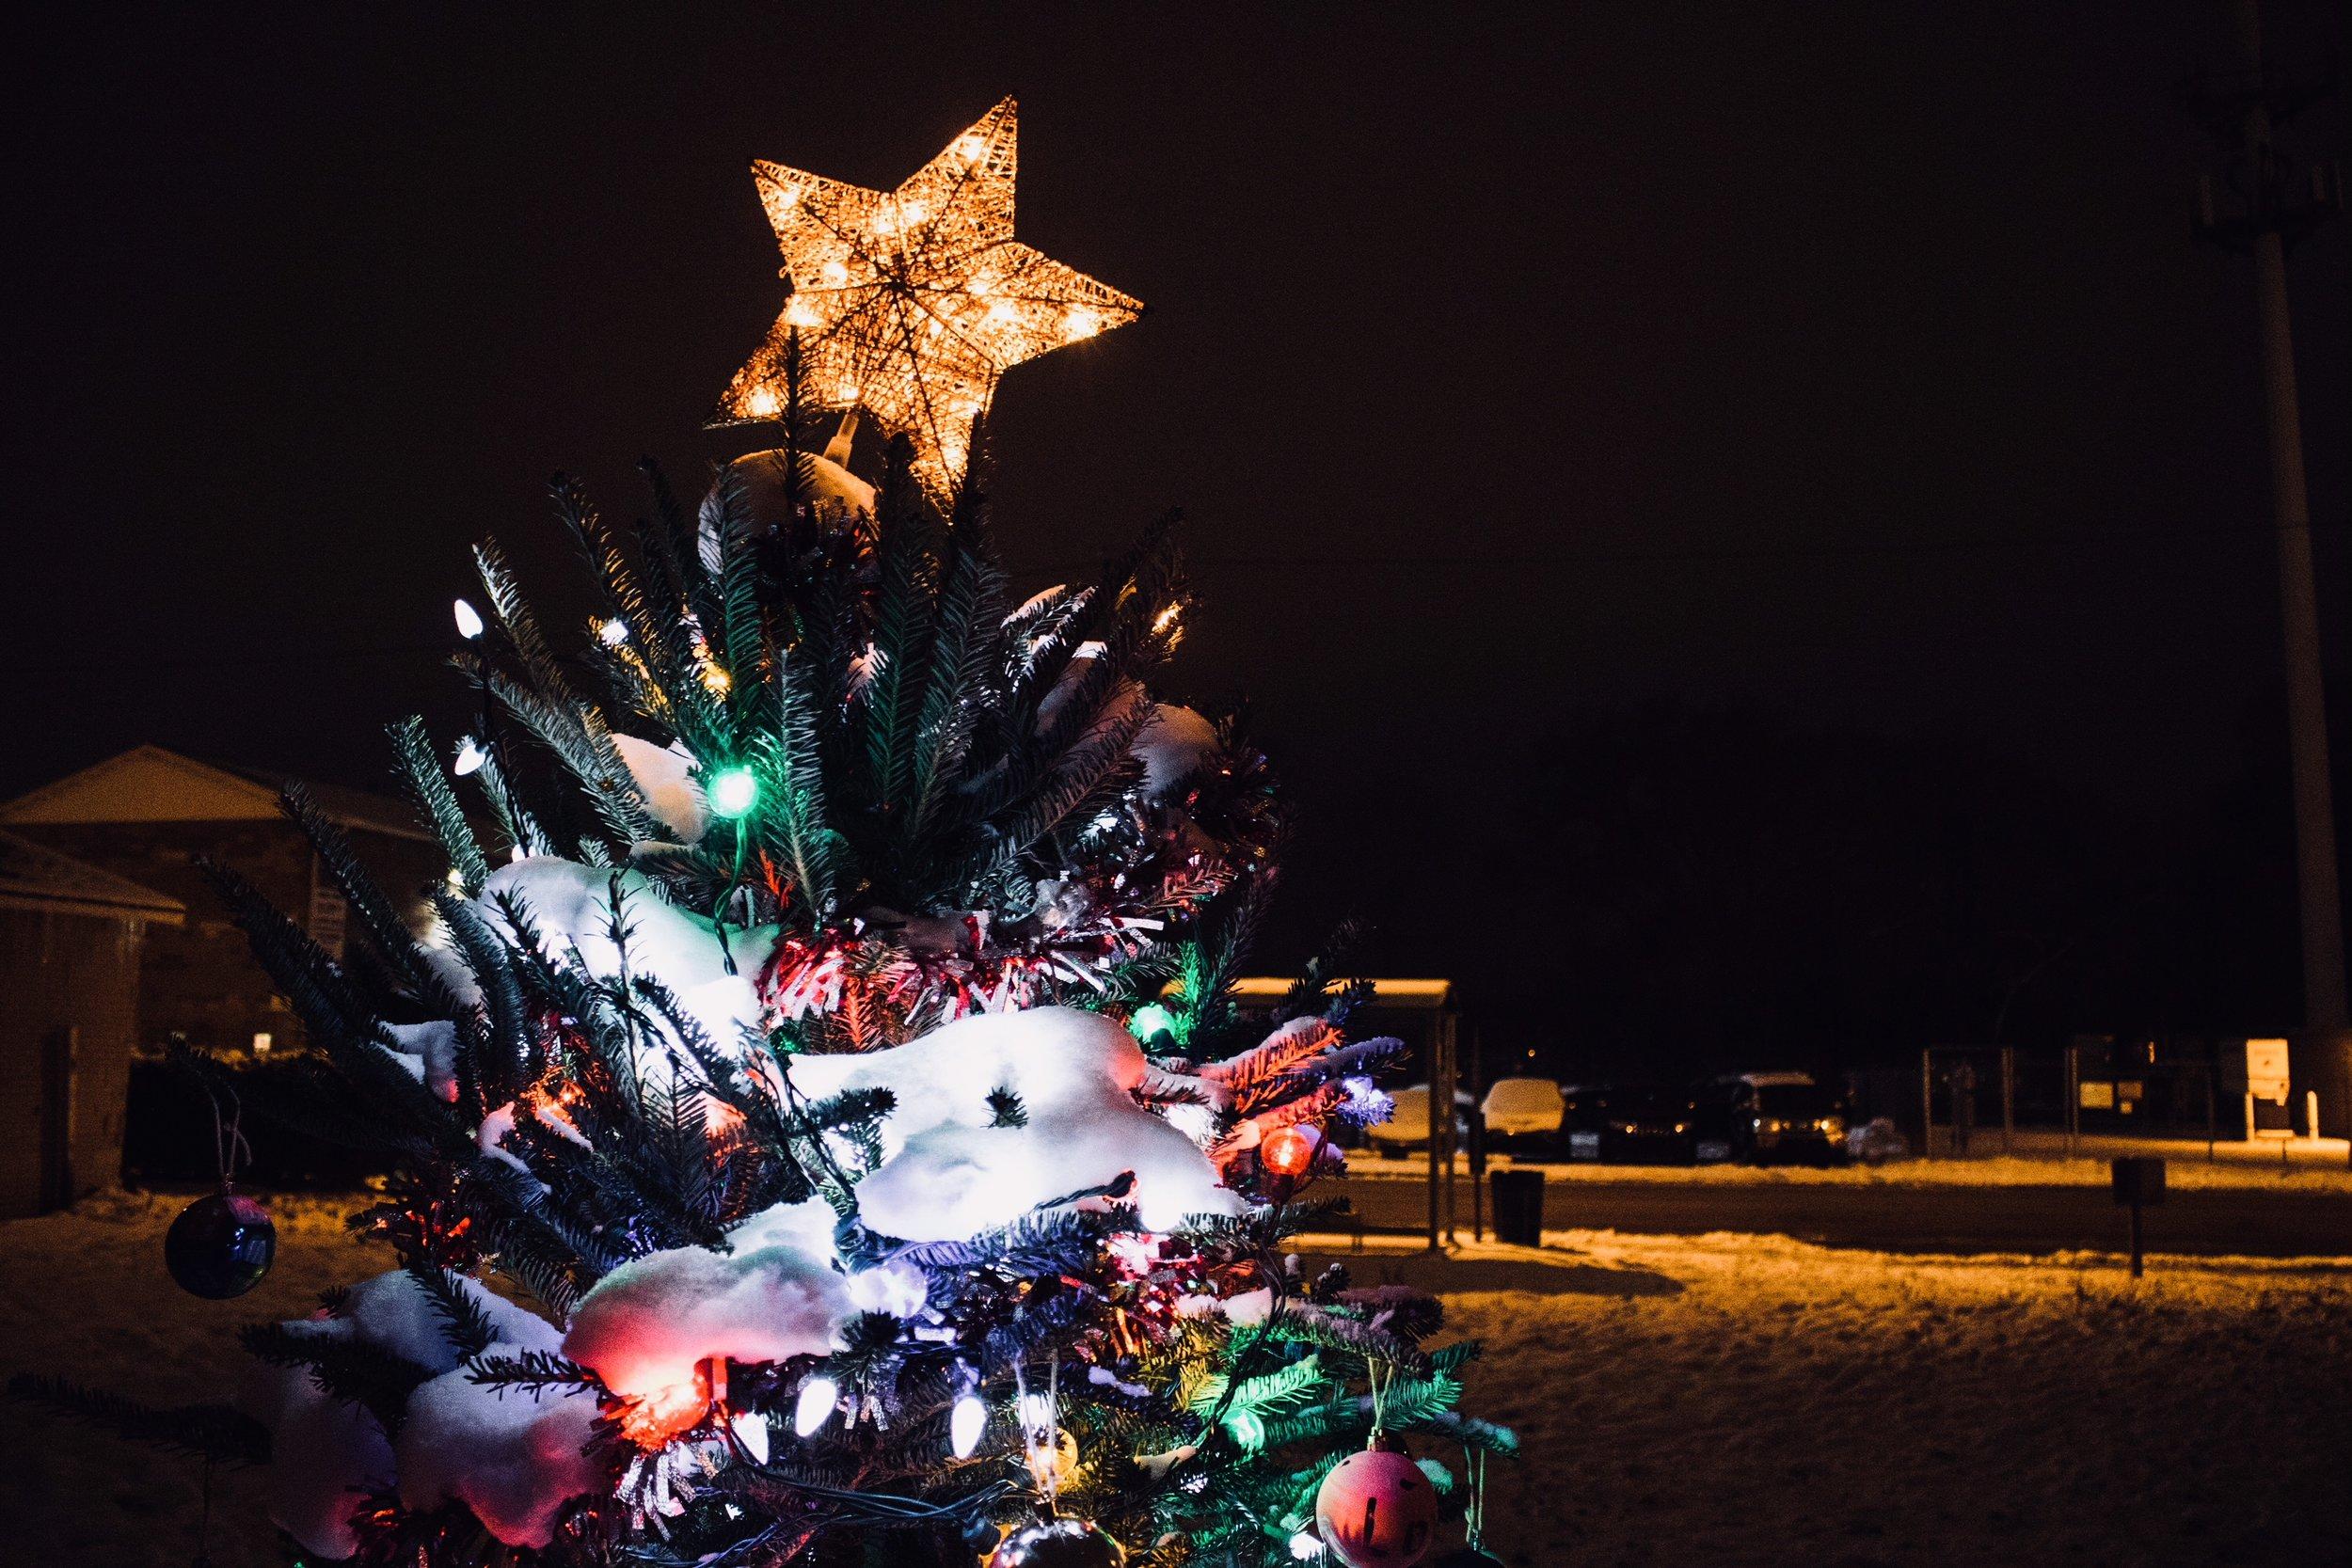 ChristmasTreeRPNEdit3.jpg